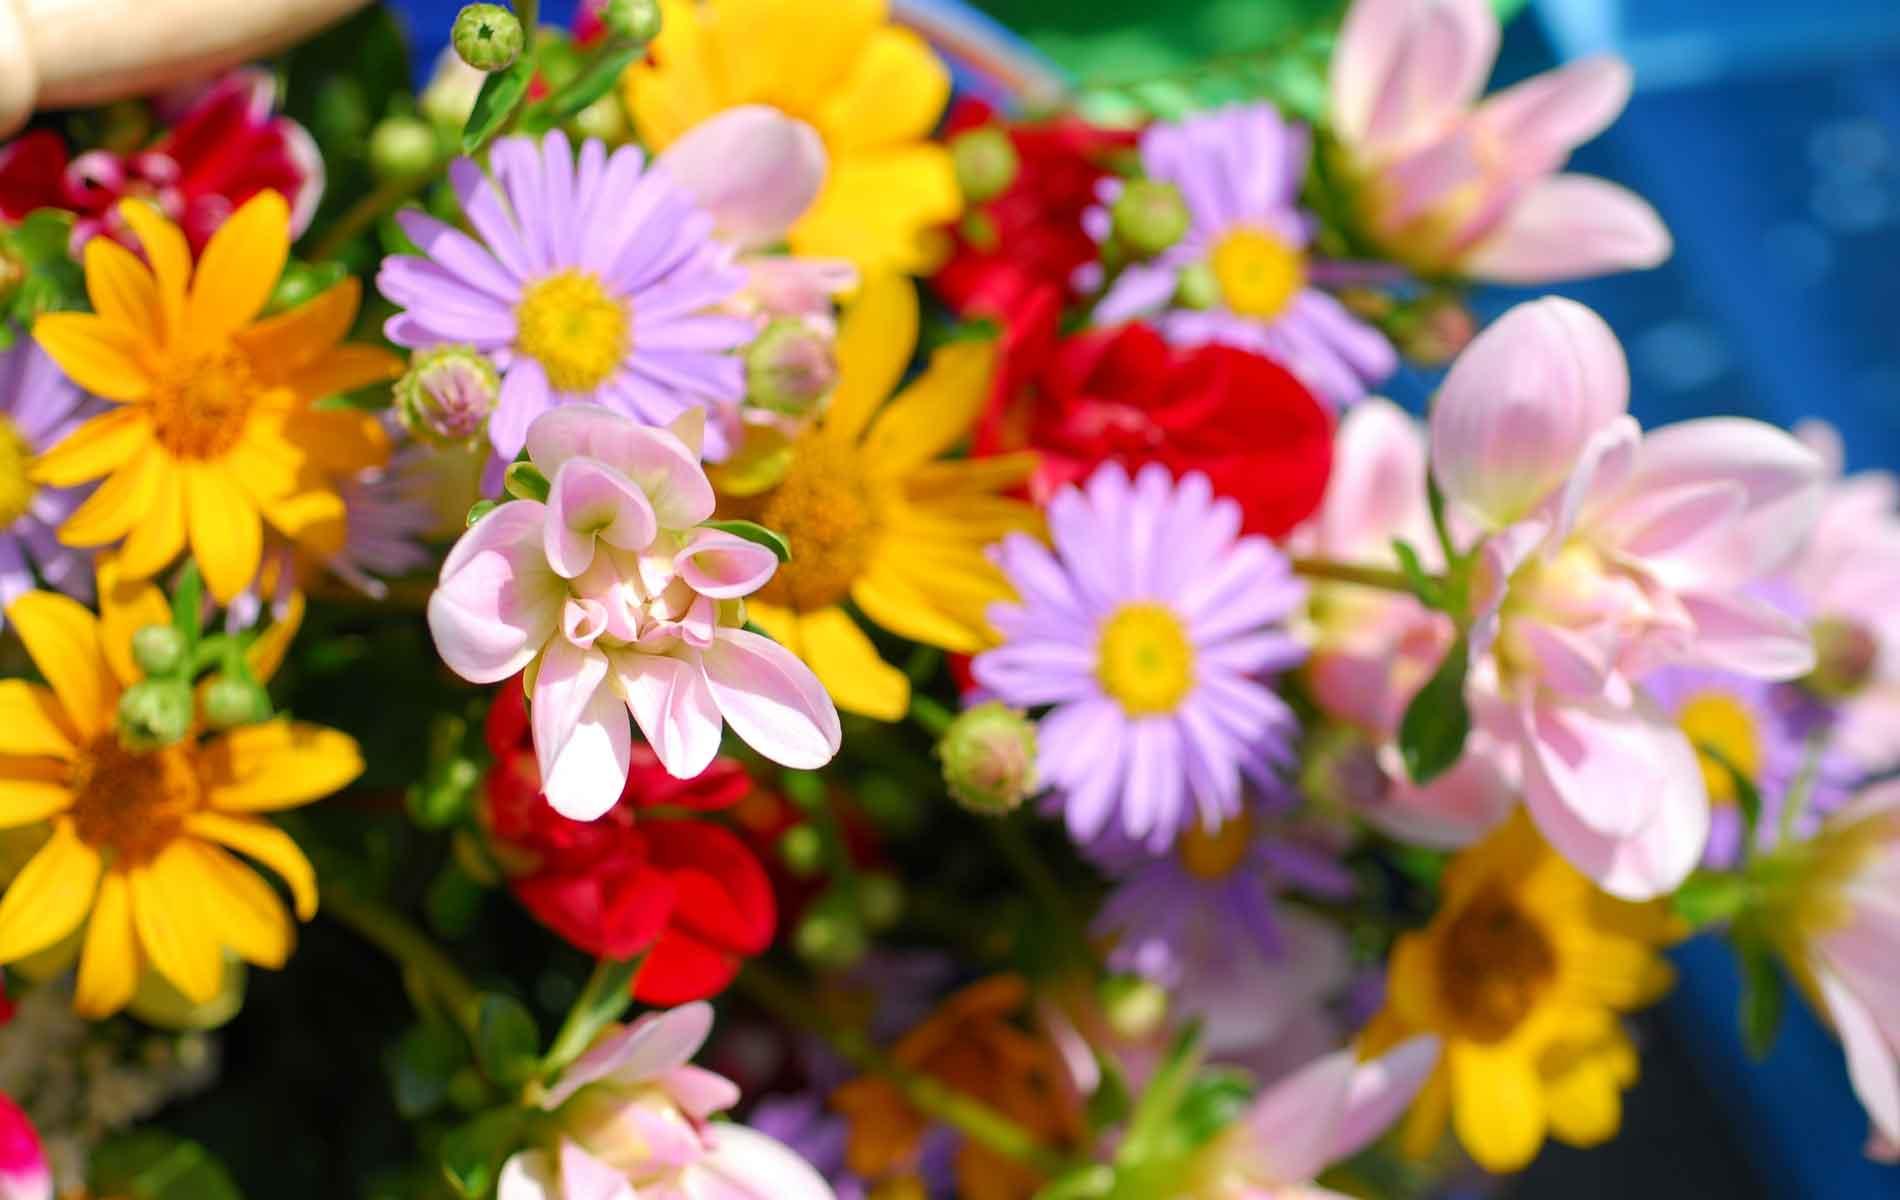 Flowers from a market in Takayama, Japan